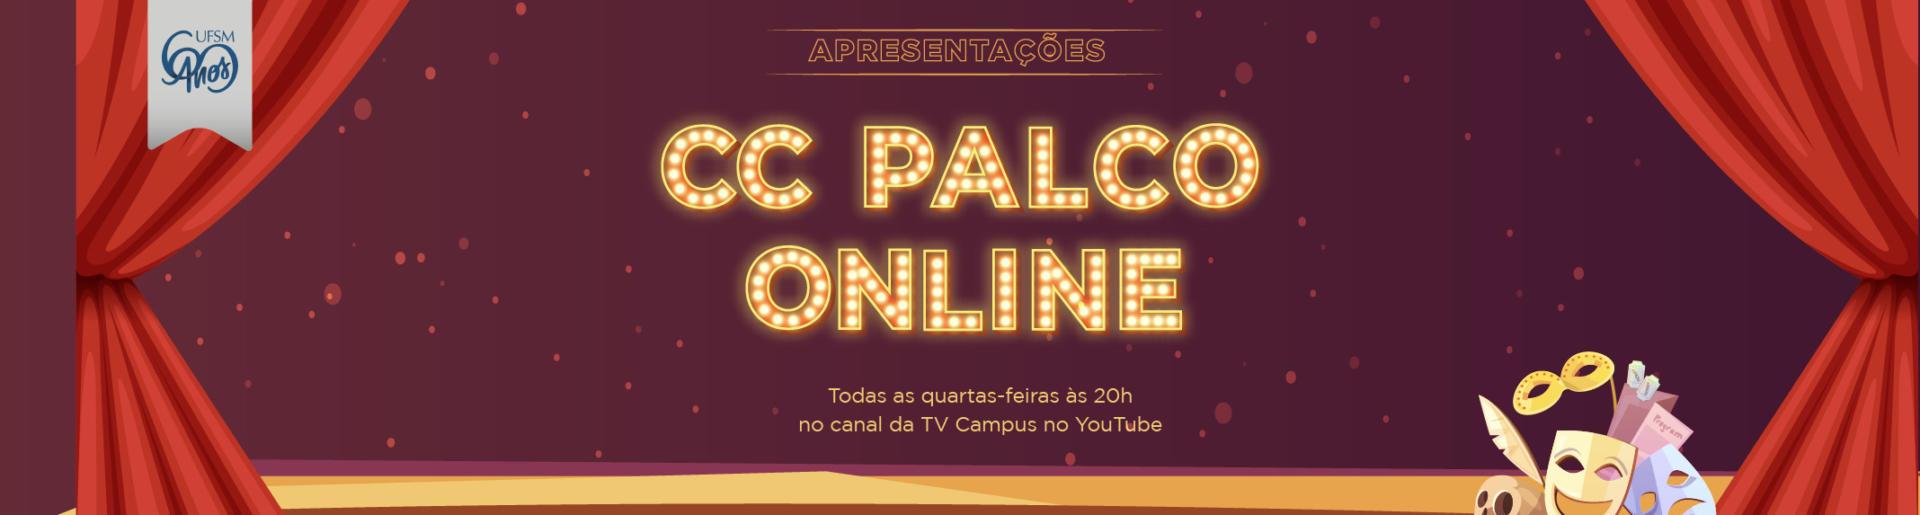 Banner CC Palco Online